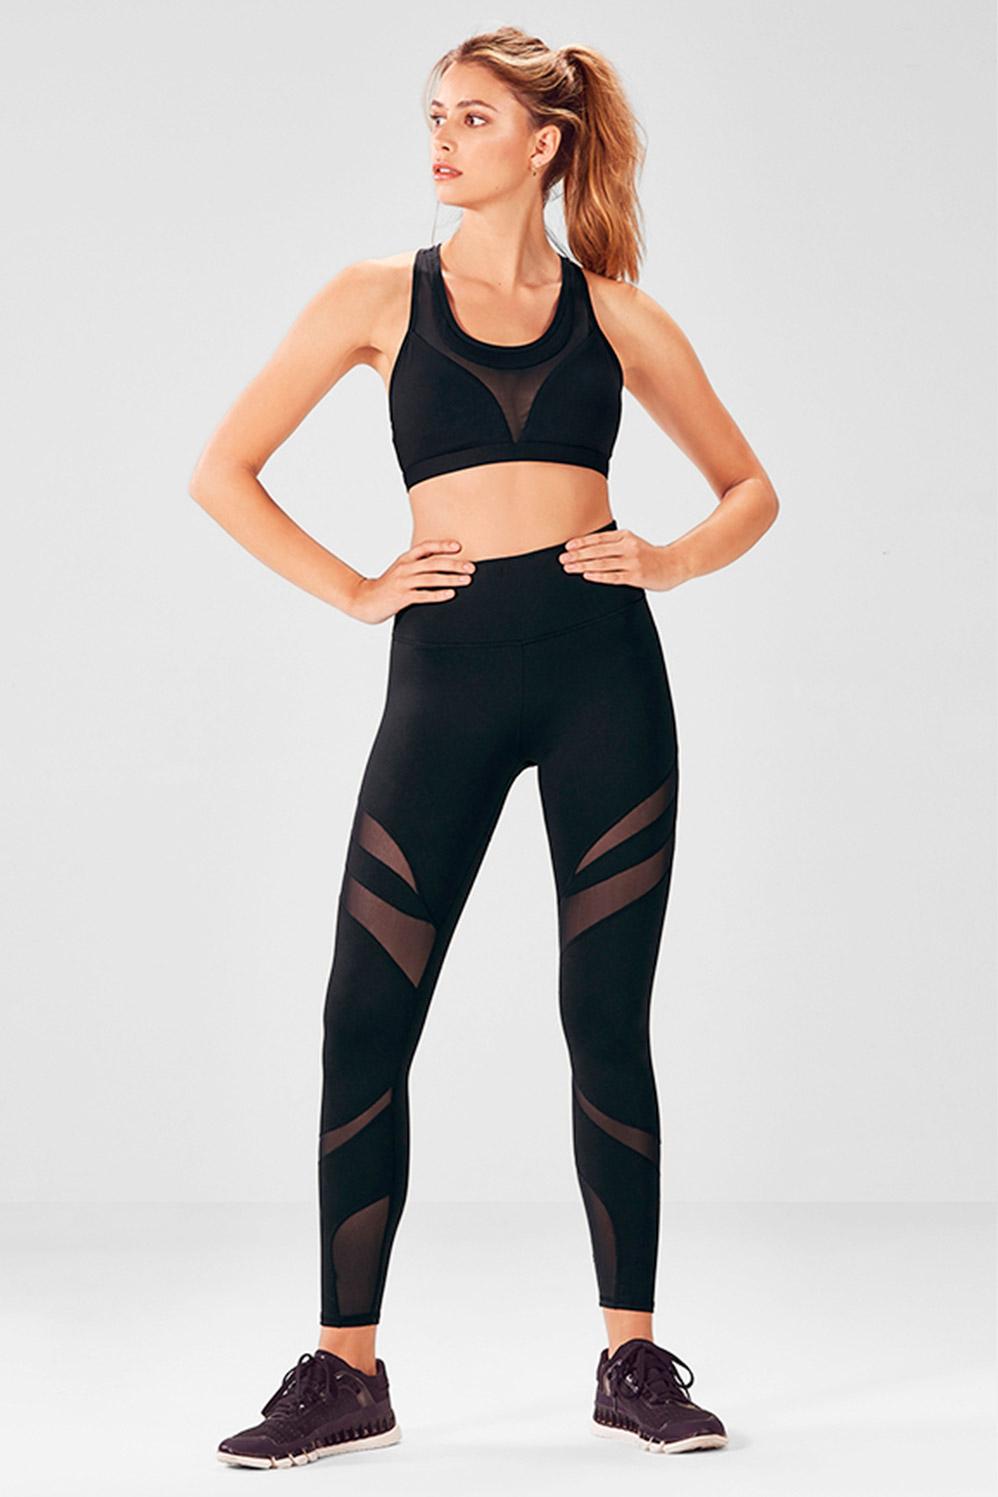 Fitness Kleidung | Workout Kleidung | Activewear | Fabletics